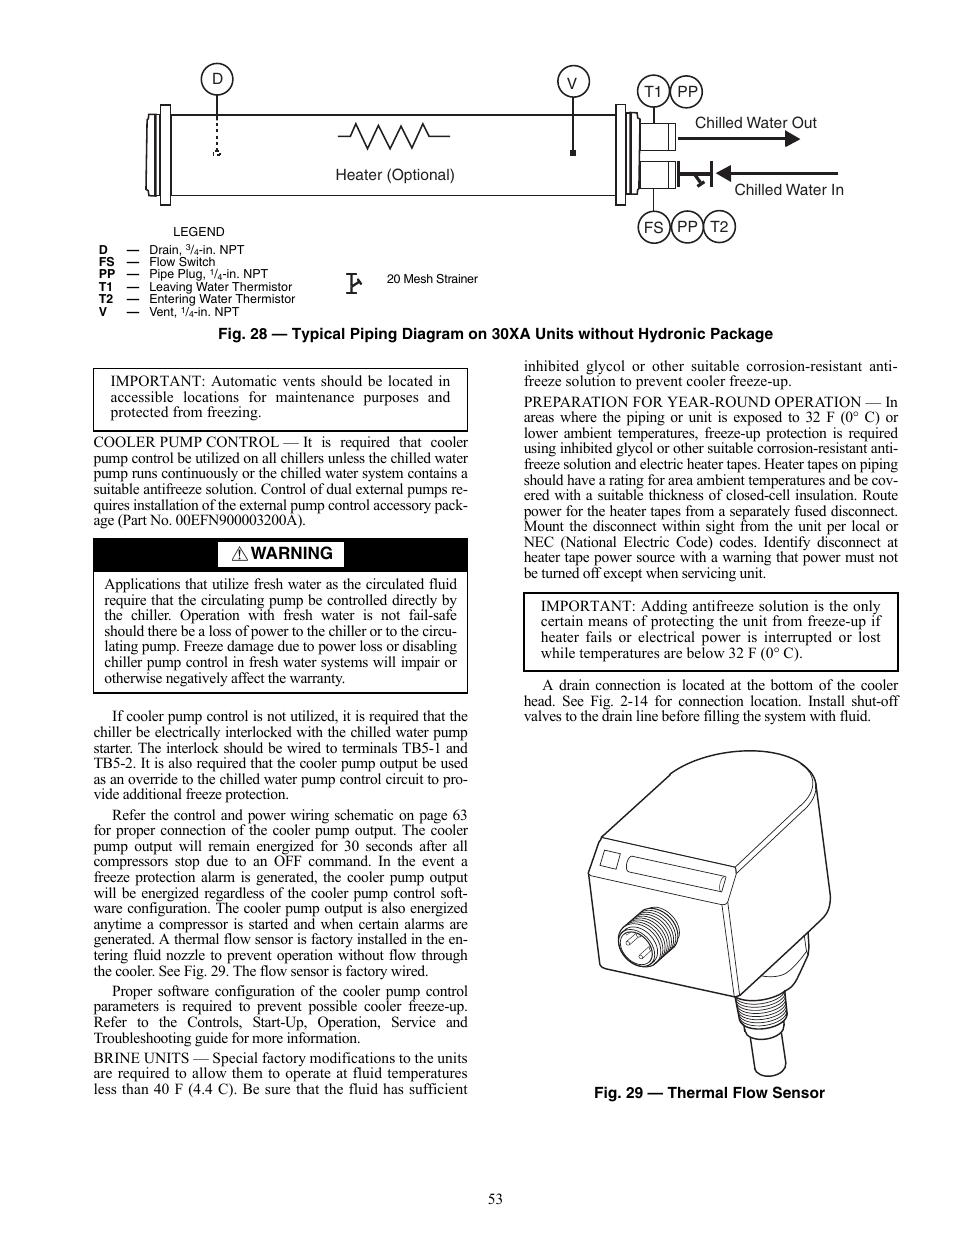 Water Cooler Wiring Diagrams Get Free Image About Wiring Diagram